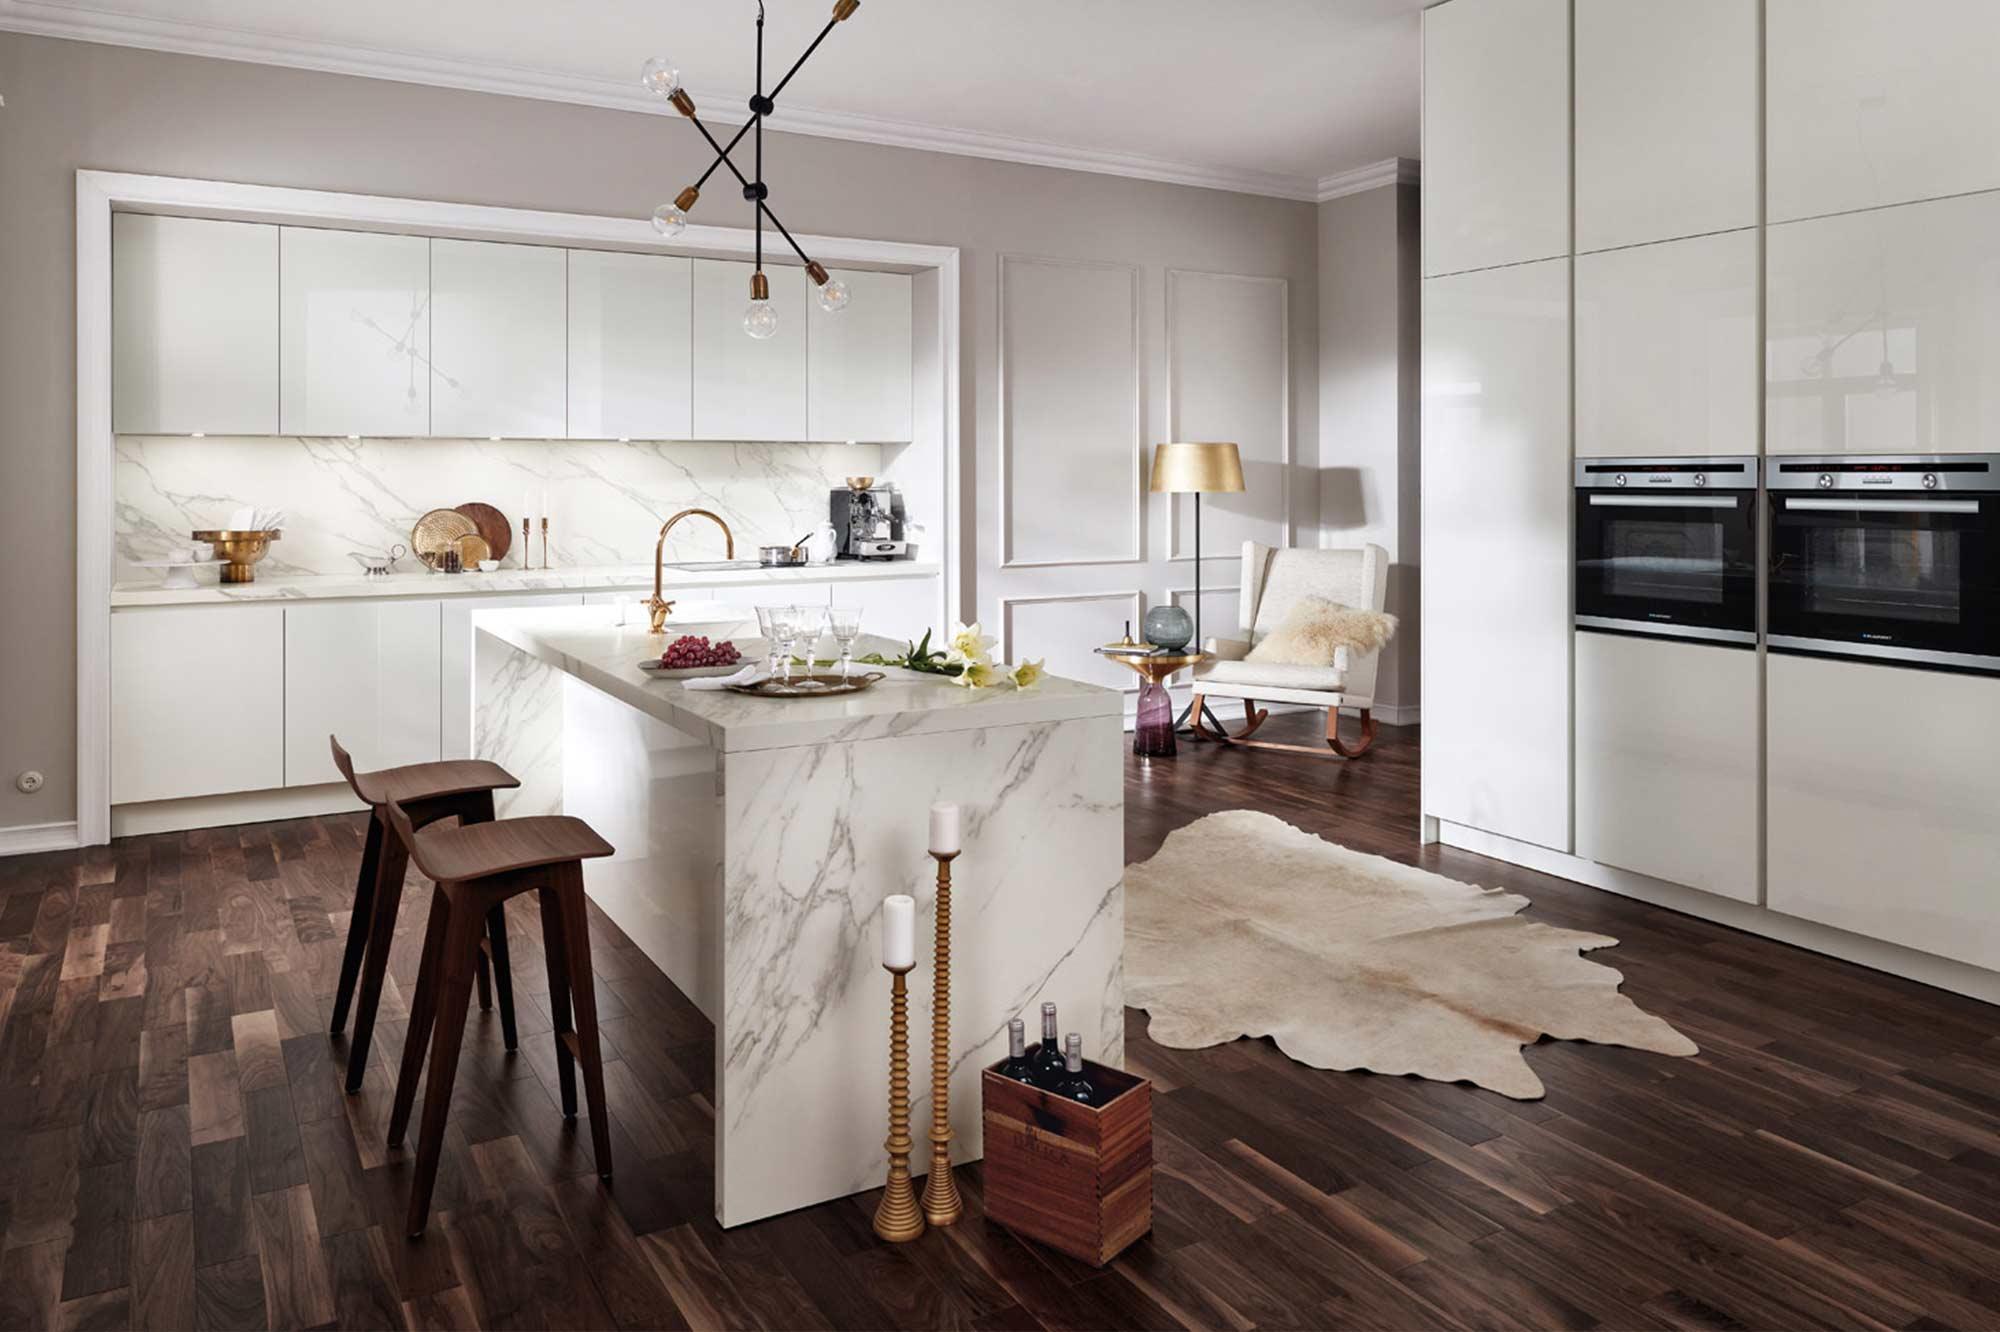 Kitchens East Kilbride 1